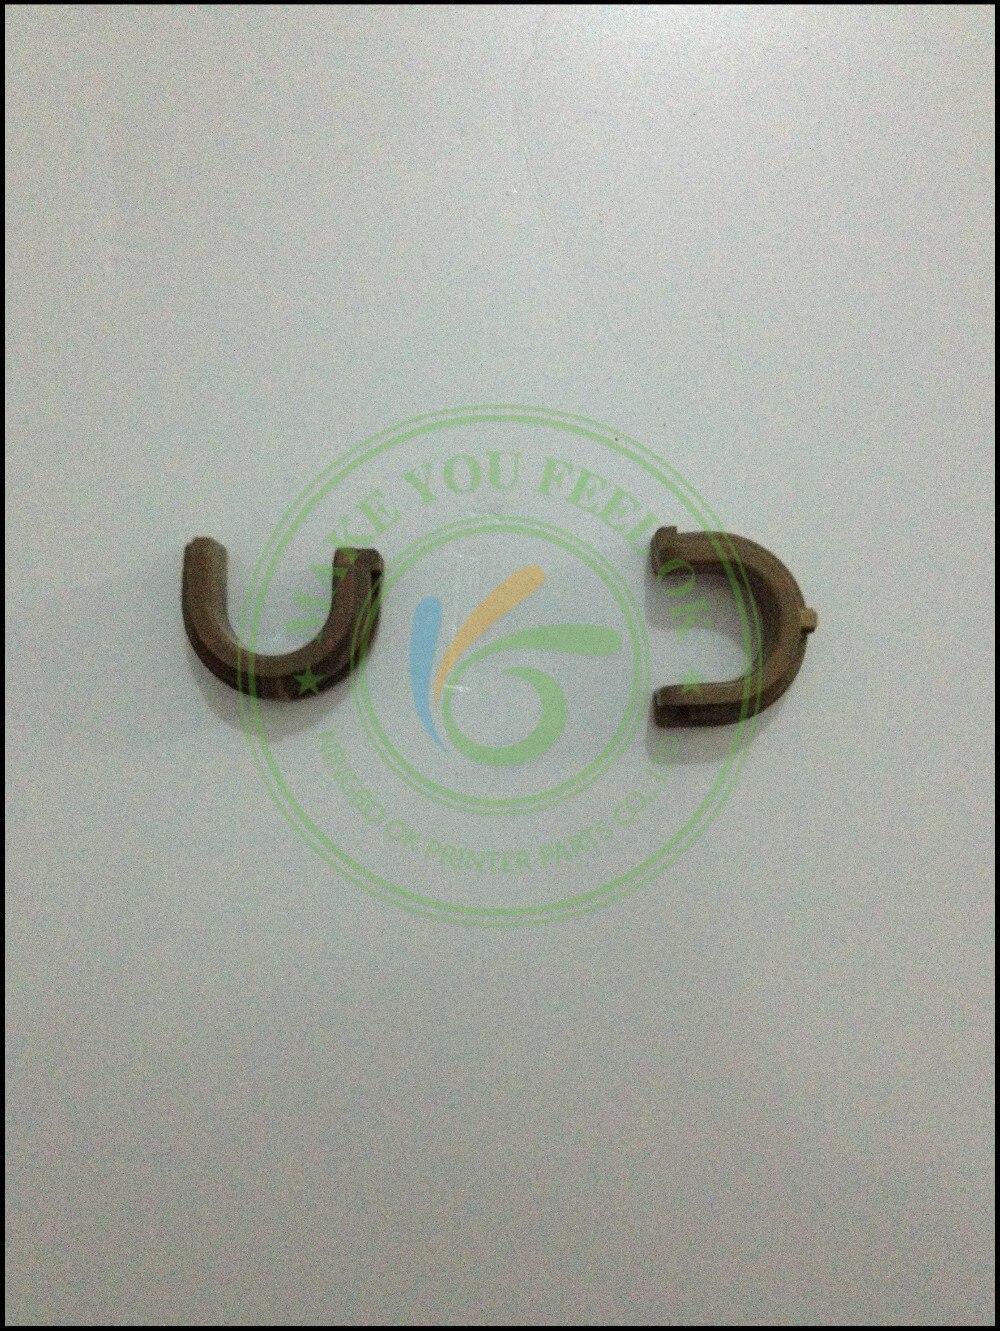 Original RC1-2079-000 BSH-1010-000 RC1-2079 BSH-1010 Bushing Pressure Roller L+R for HP 1010 1012 1015 1020 1022 3050 3055 3052